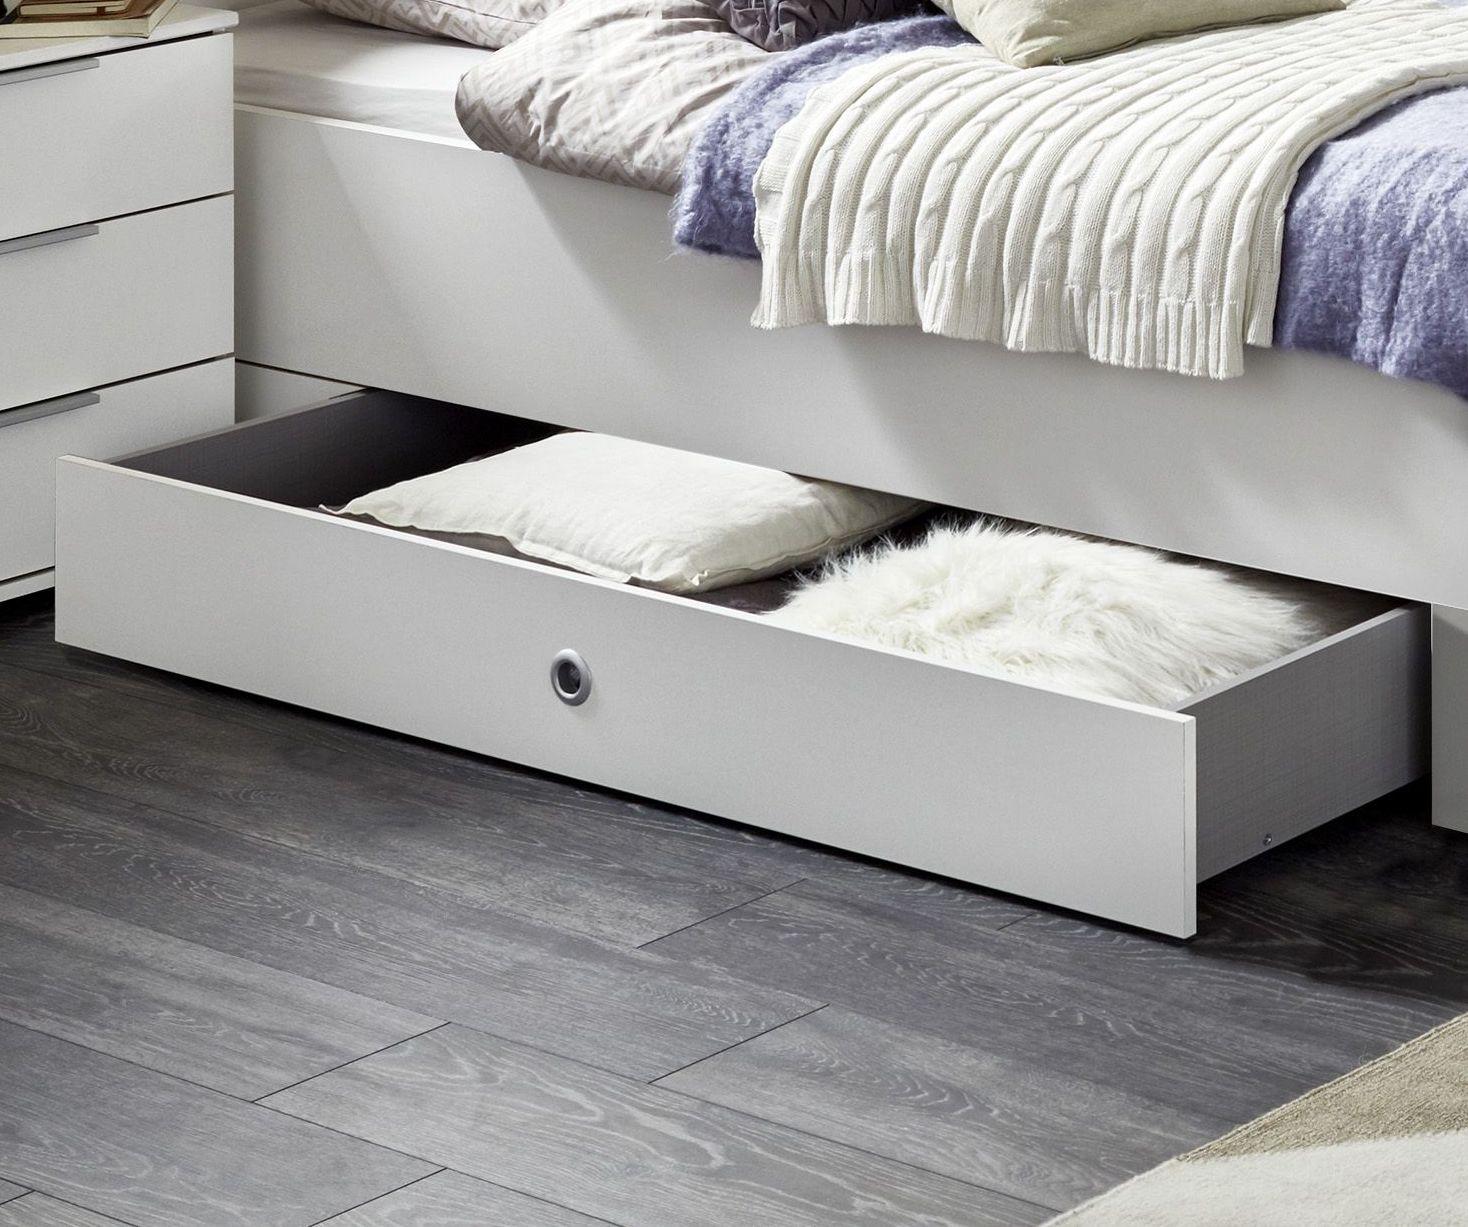 einzelbett mit stauraum einzelbett mit stauraum hause deko ideen einzelbett mit stauraum. Black Bedroom Furniture Sets. Home Design Ideas